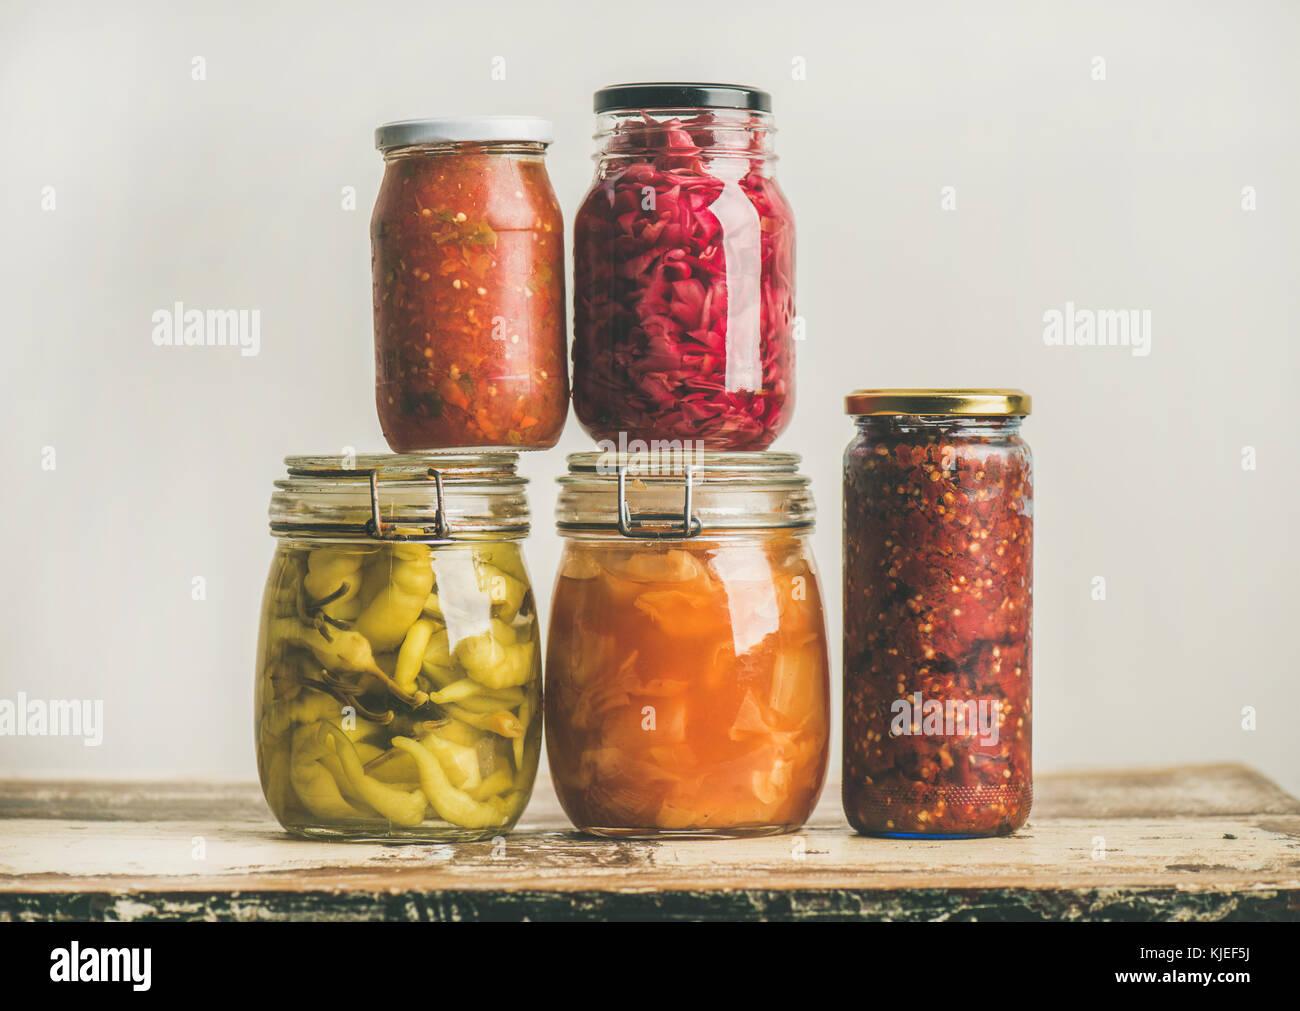 Temporada de otoño o encurtido de vegetales fermentados. inicio conservación de alimentos. Imagen De Stock